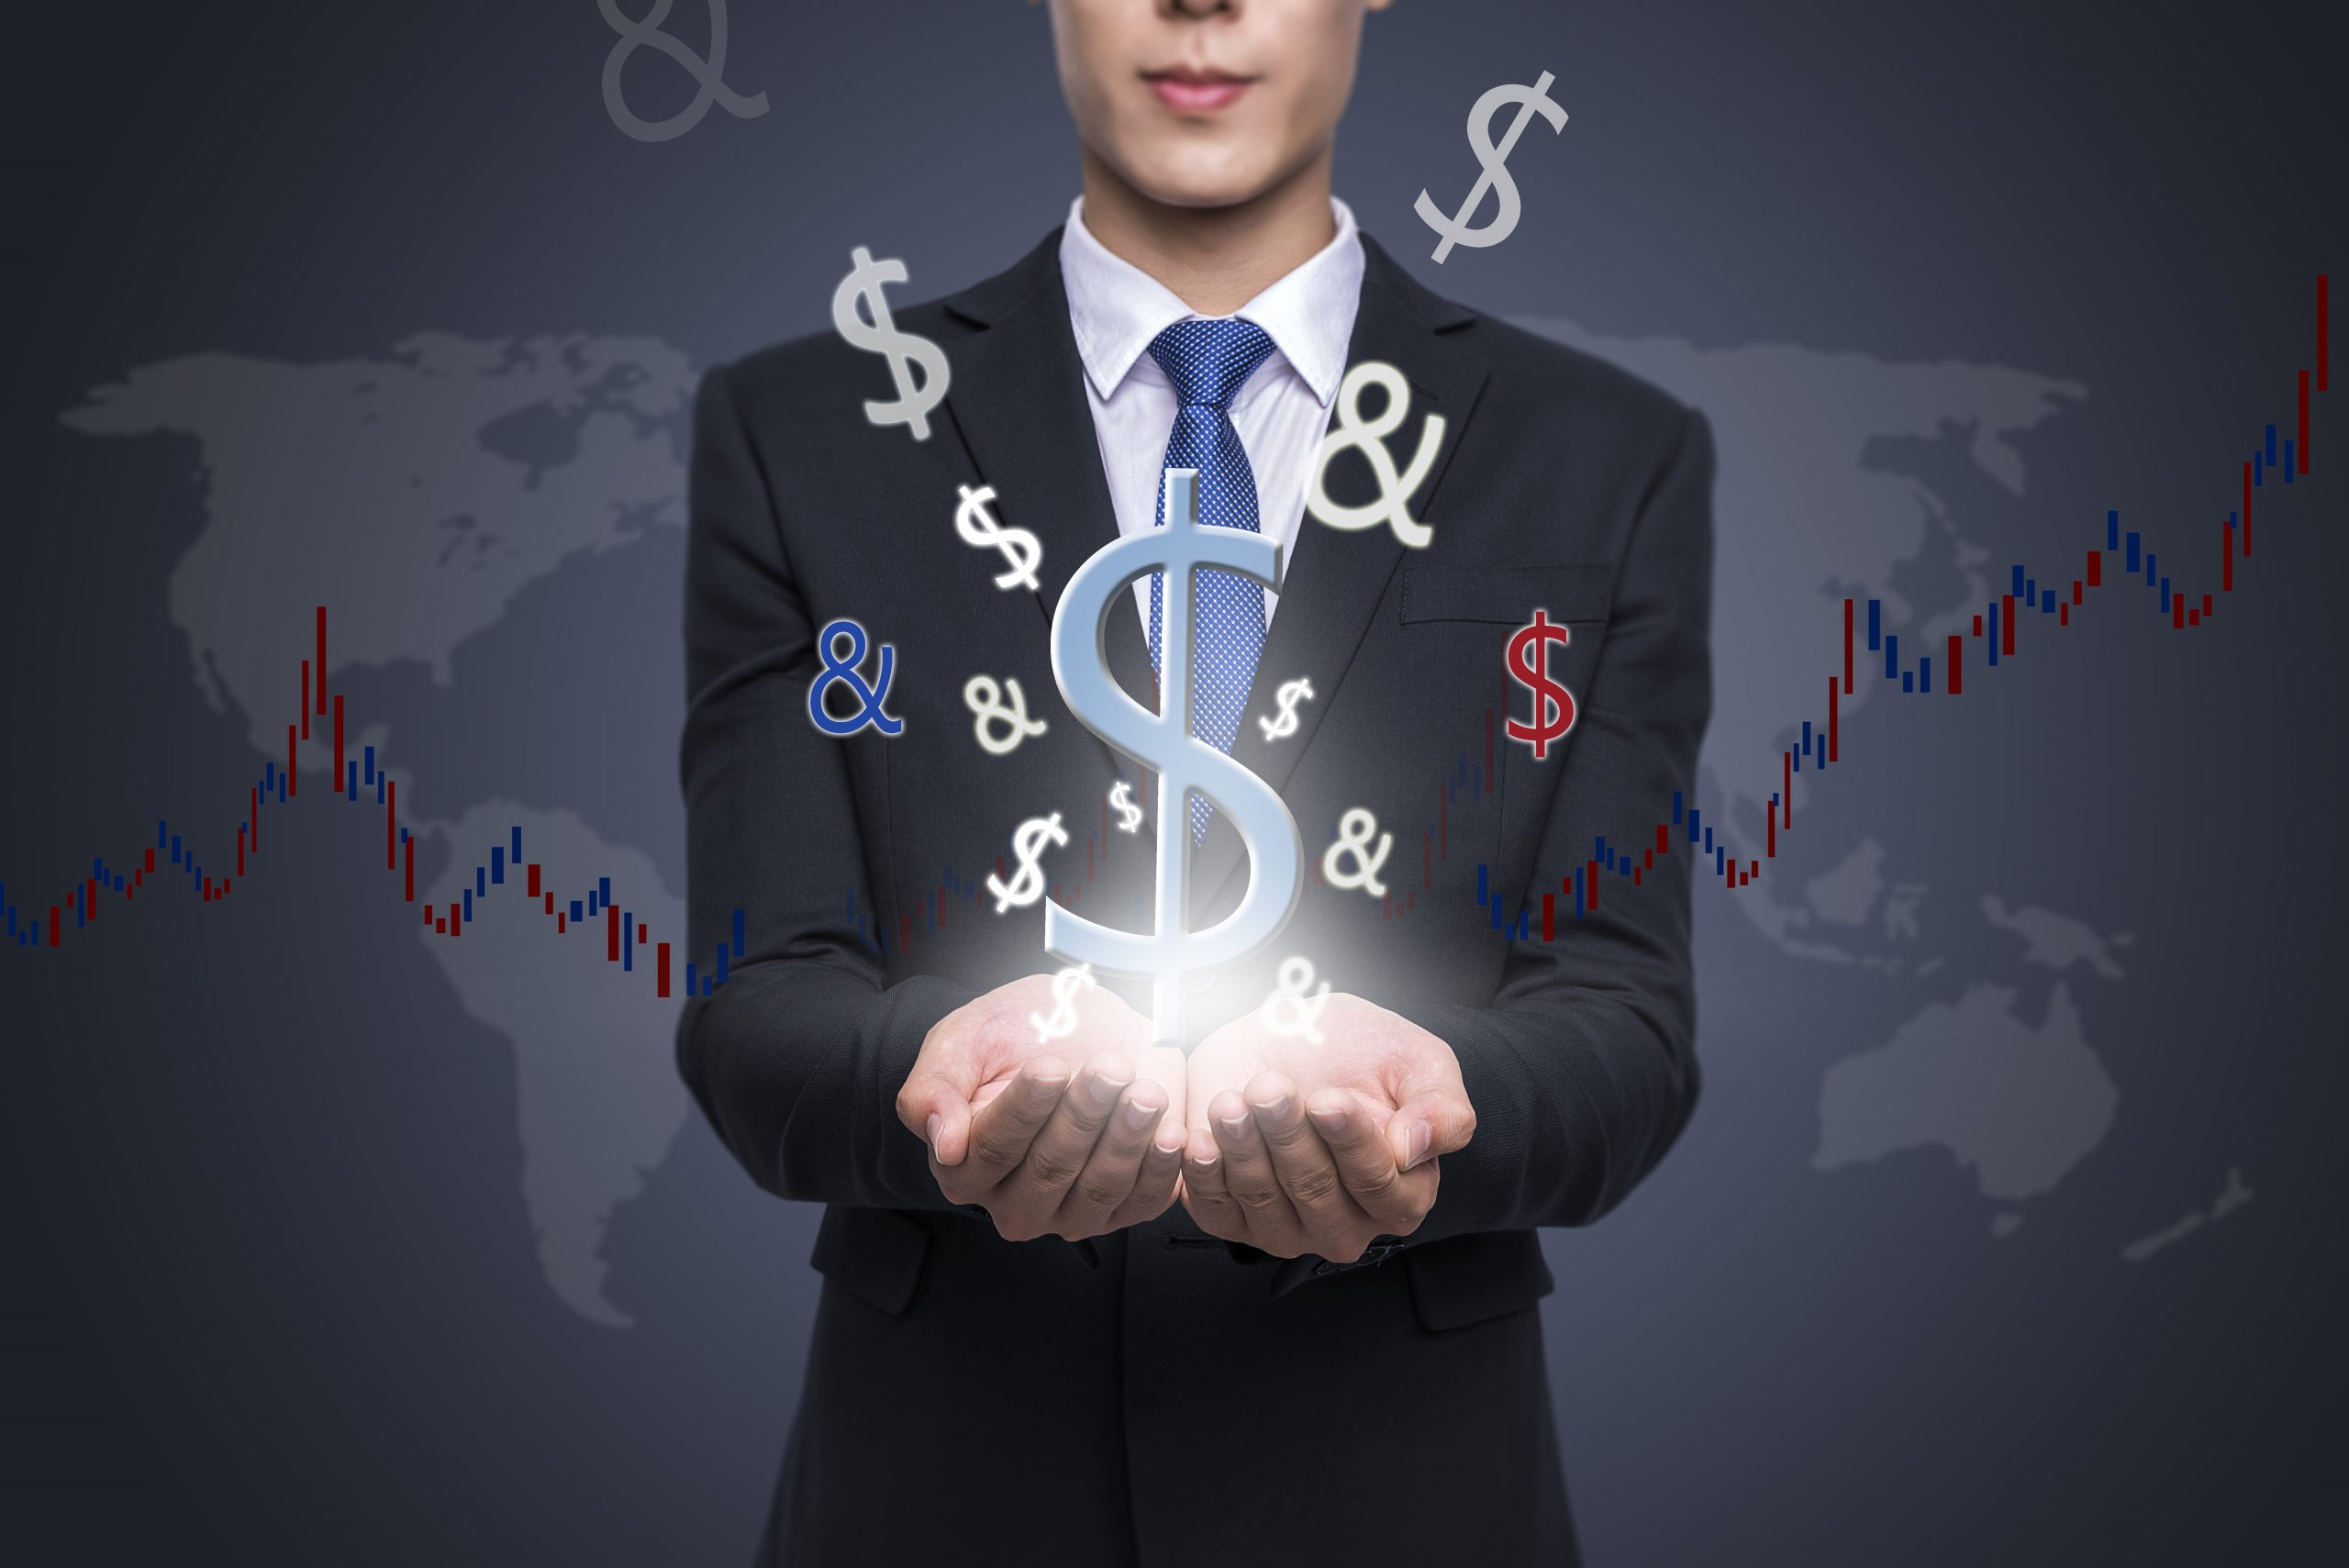 Lovepik_com-500738206-business-finance